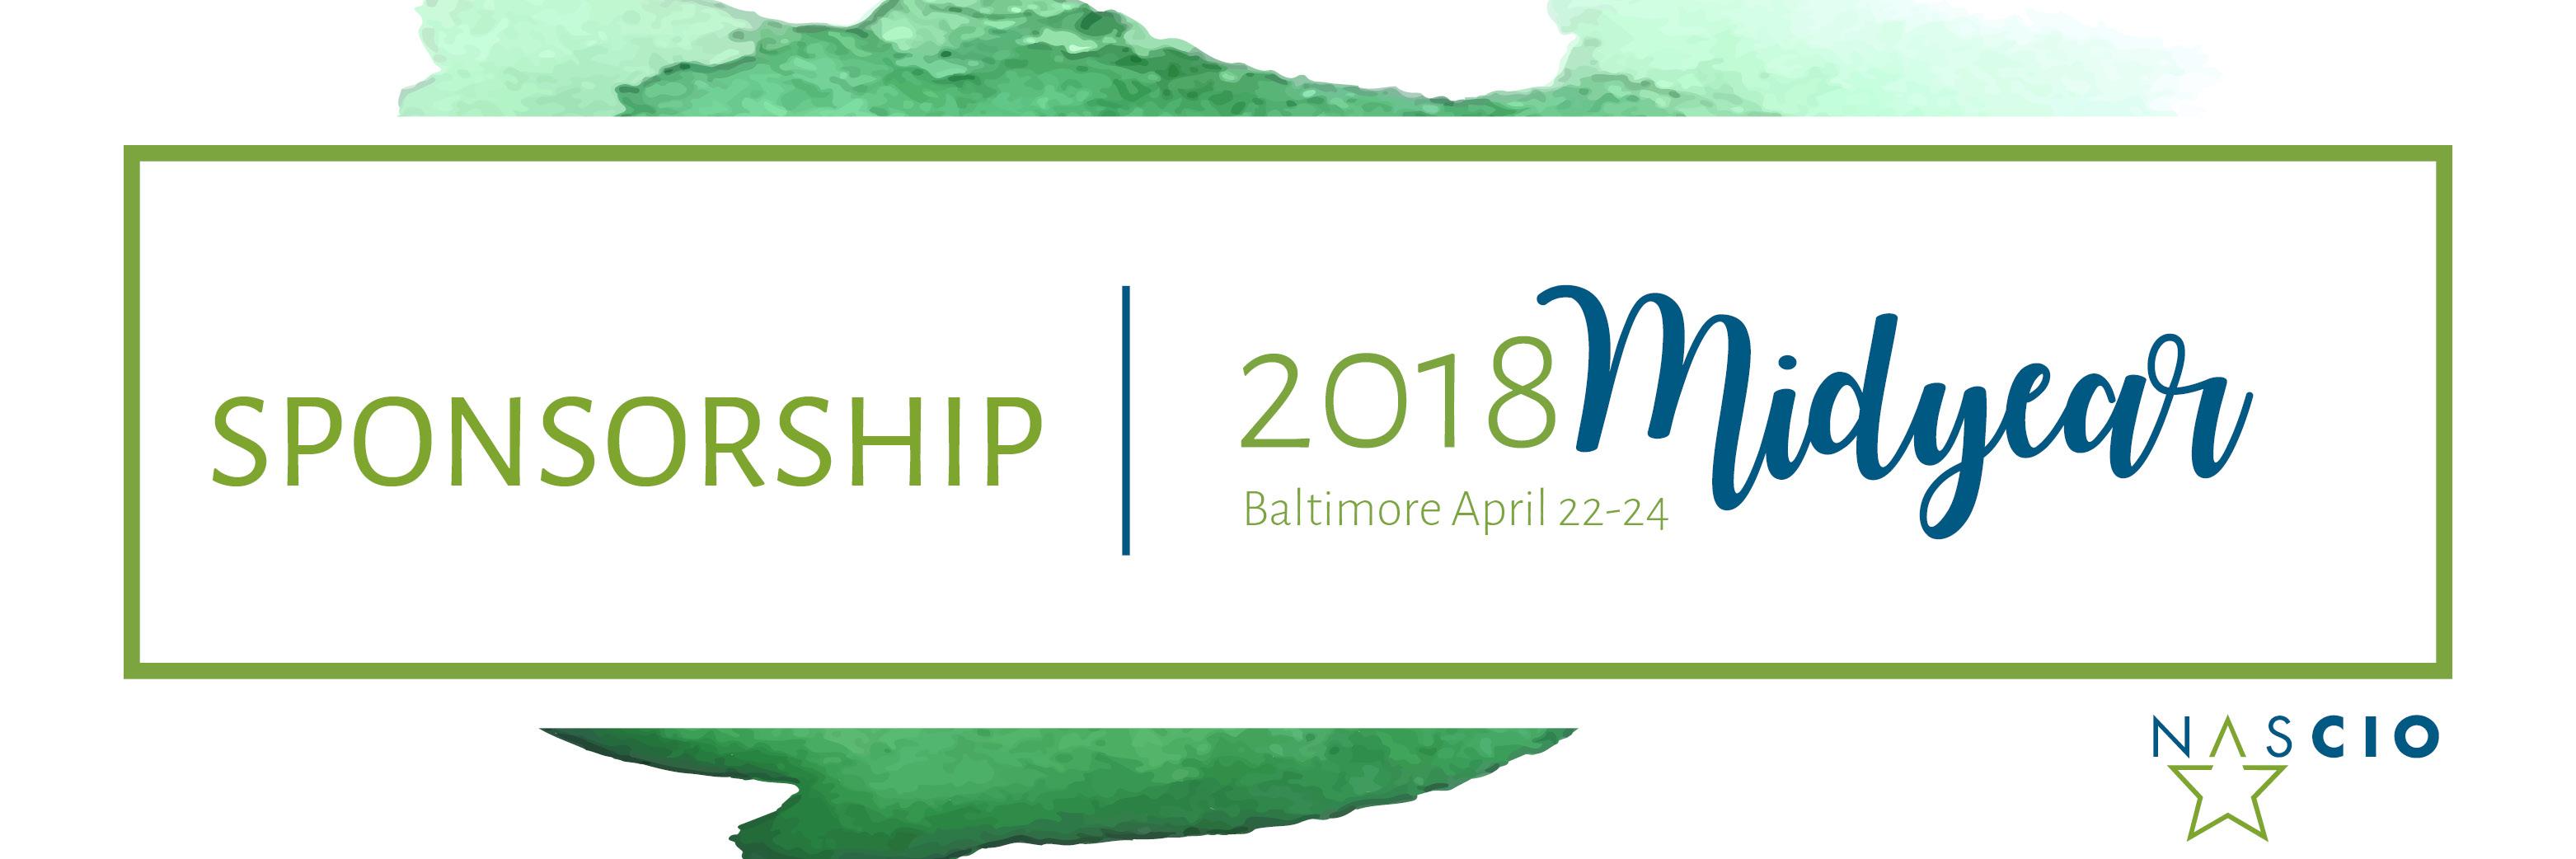 NASCIO 2018 Midyear Conference Sponsorship